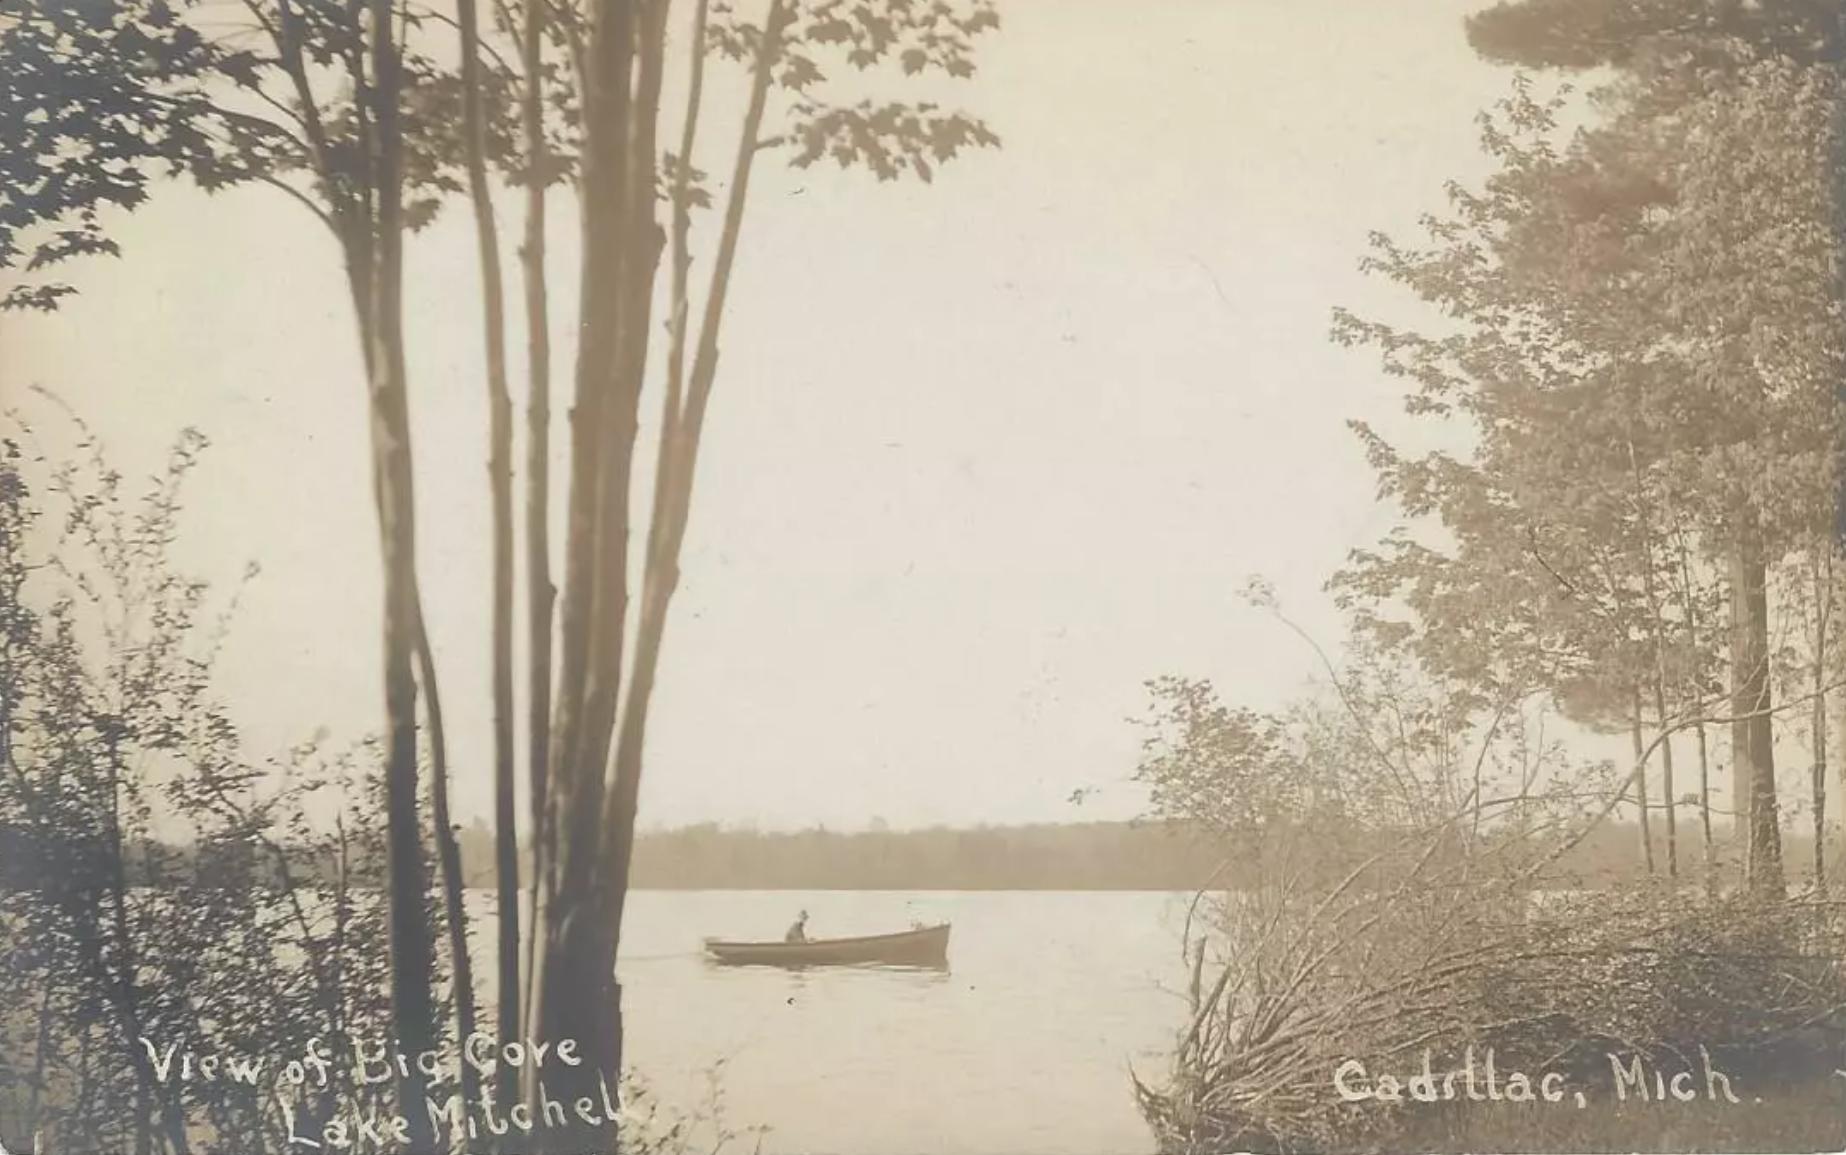 Cadillac – Recreation – Lake Mitchell